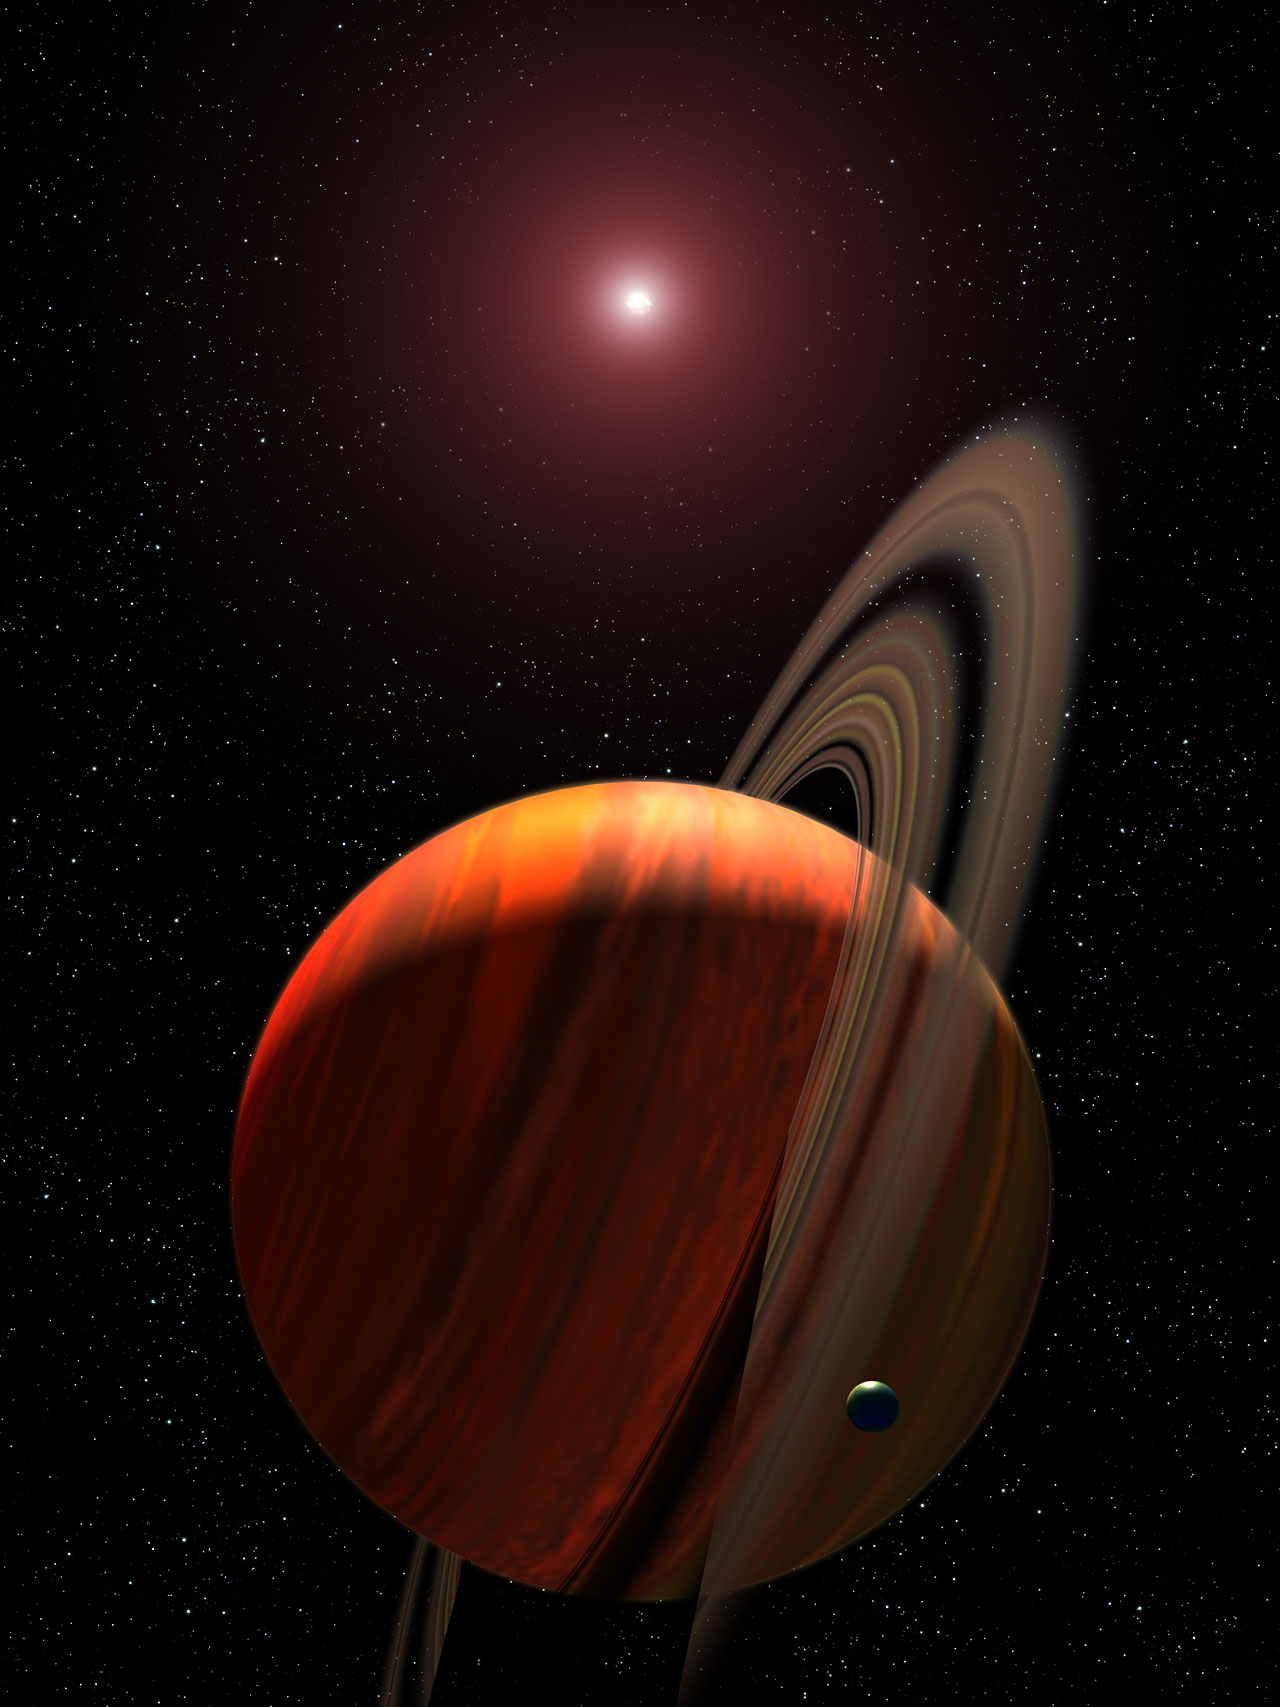 Artist's View of Planet Around a Red Dwarf